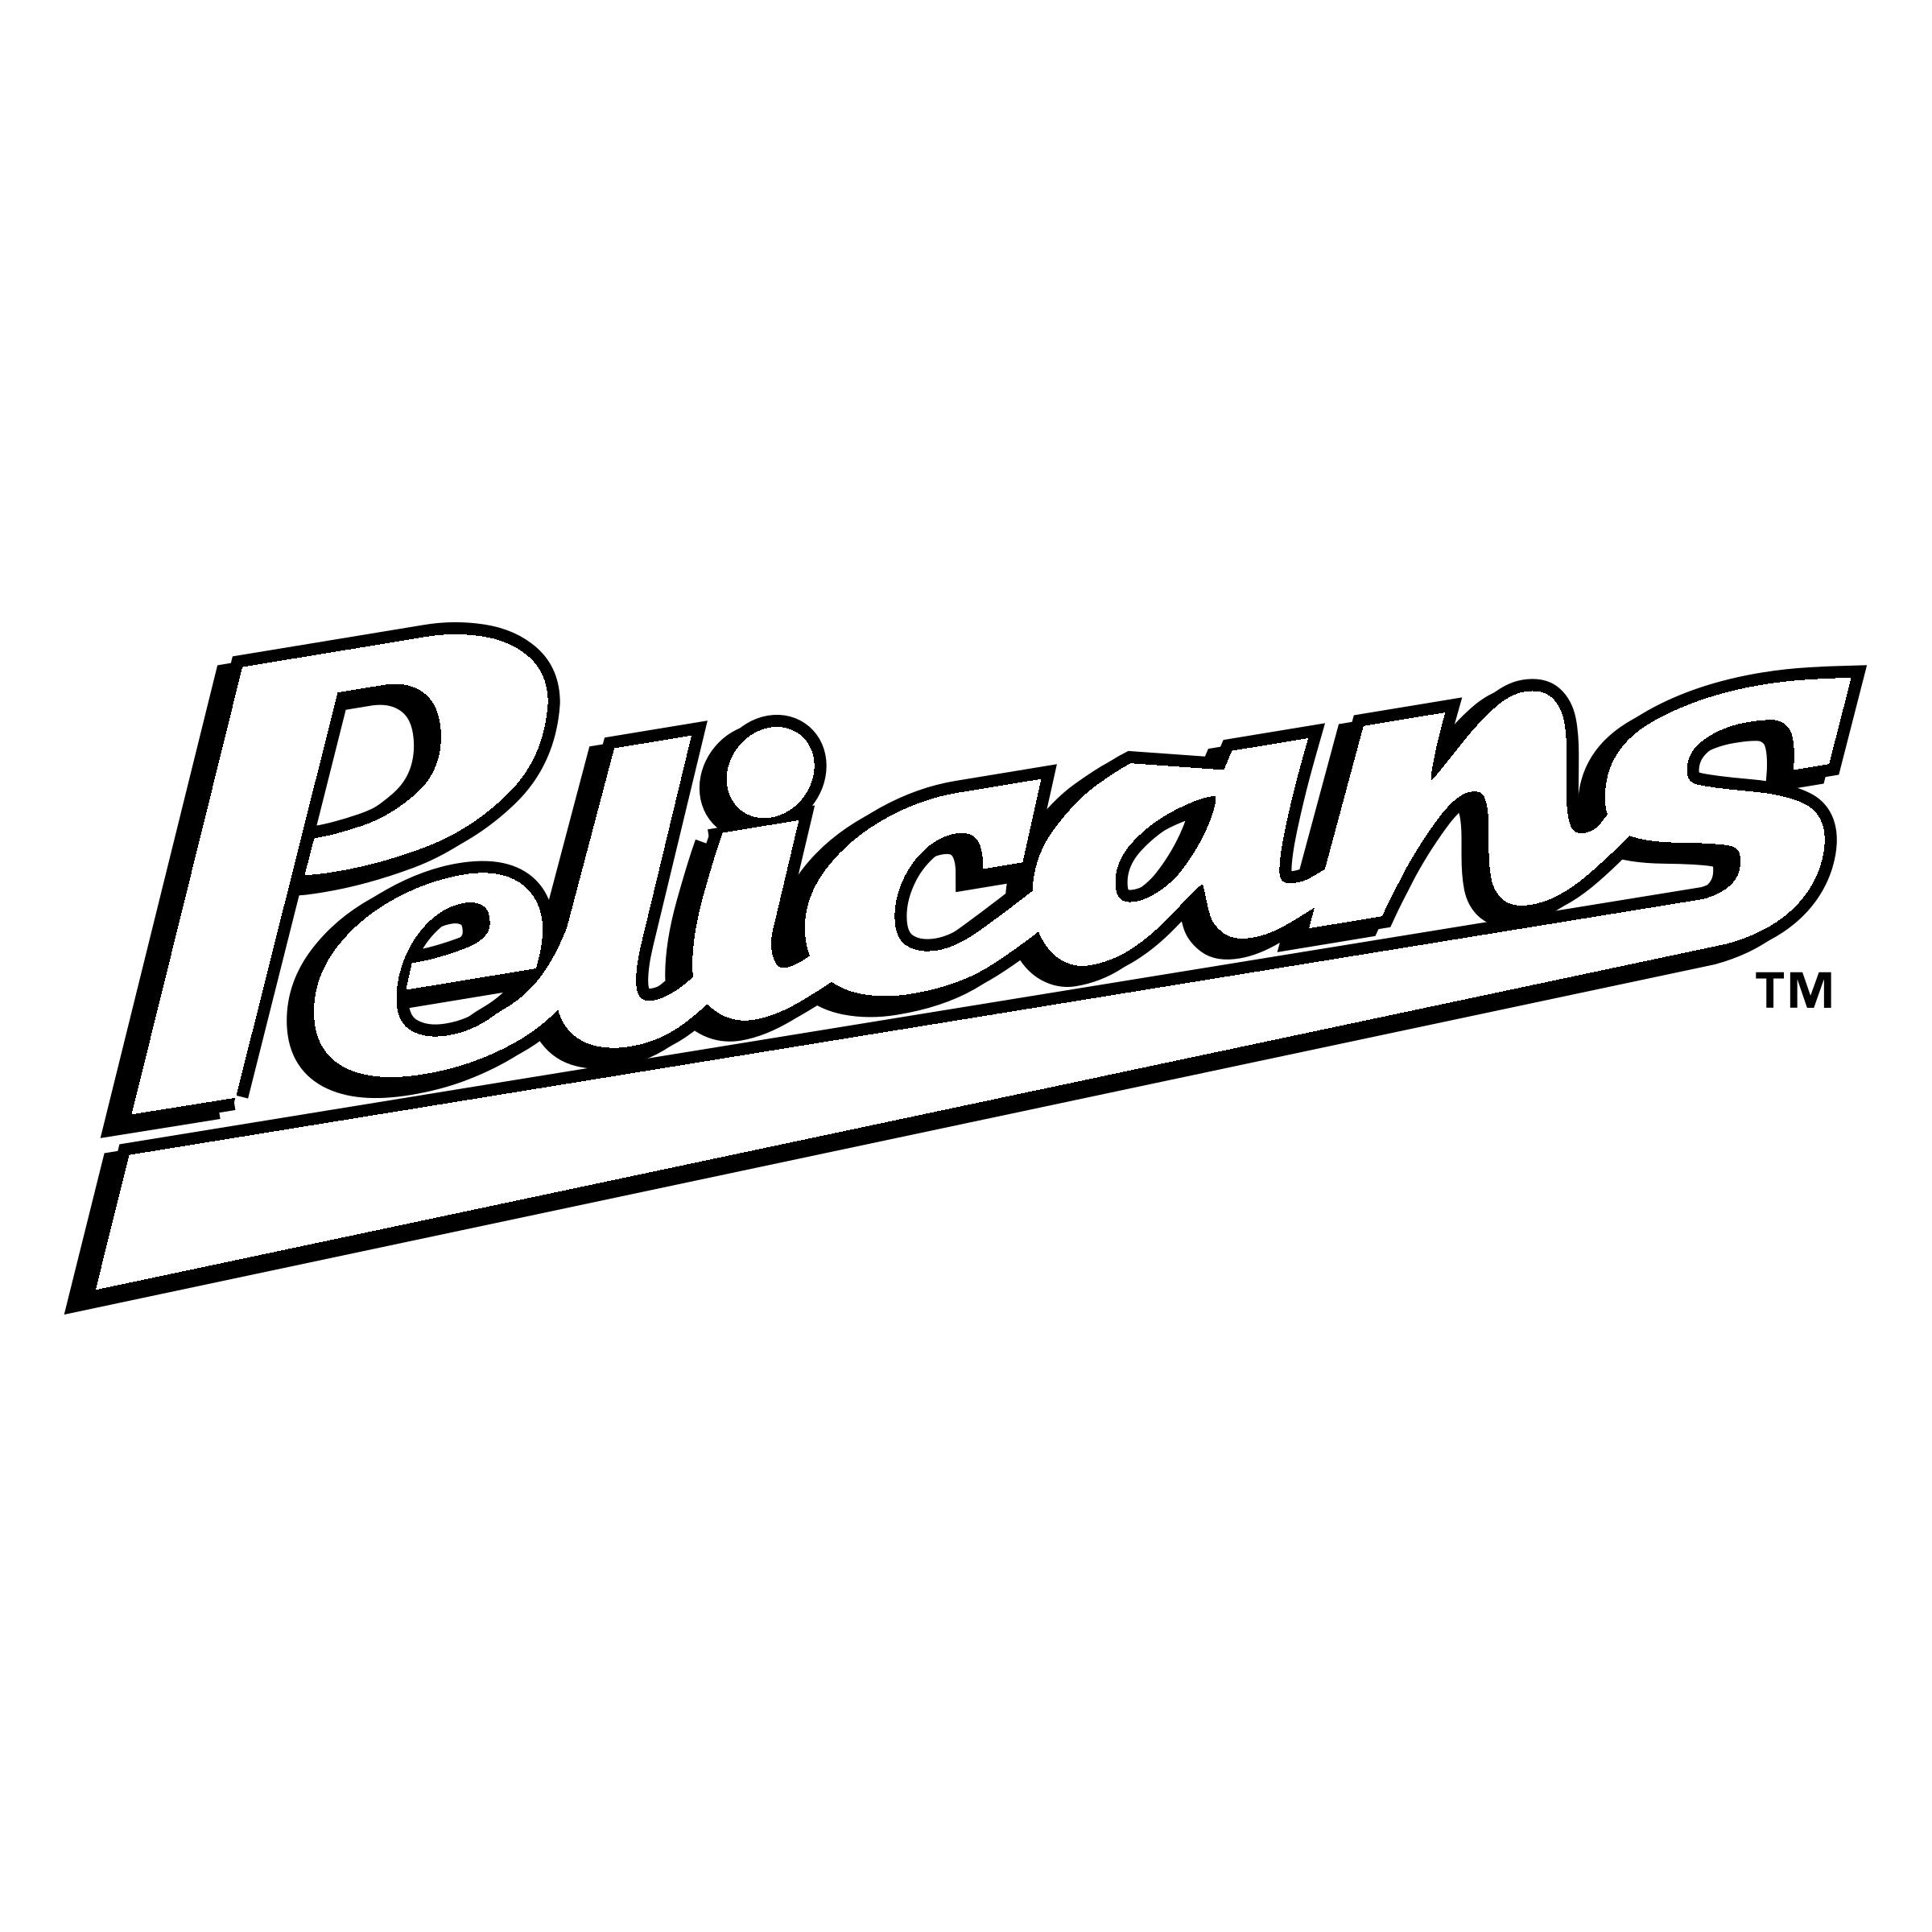 Myrtle Beach Pelicans Logo Png Transparent Svg Vector Freebie Supply